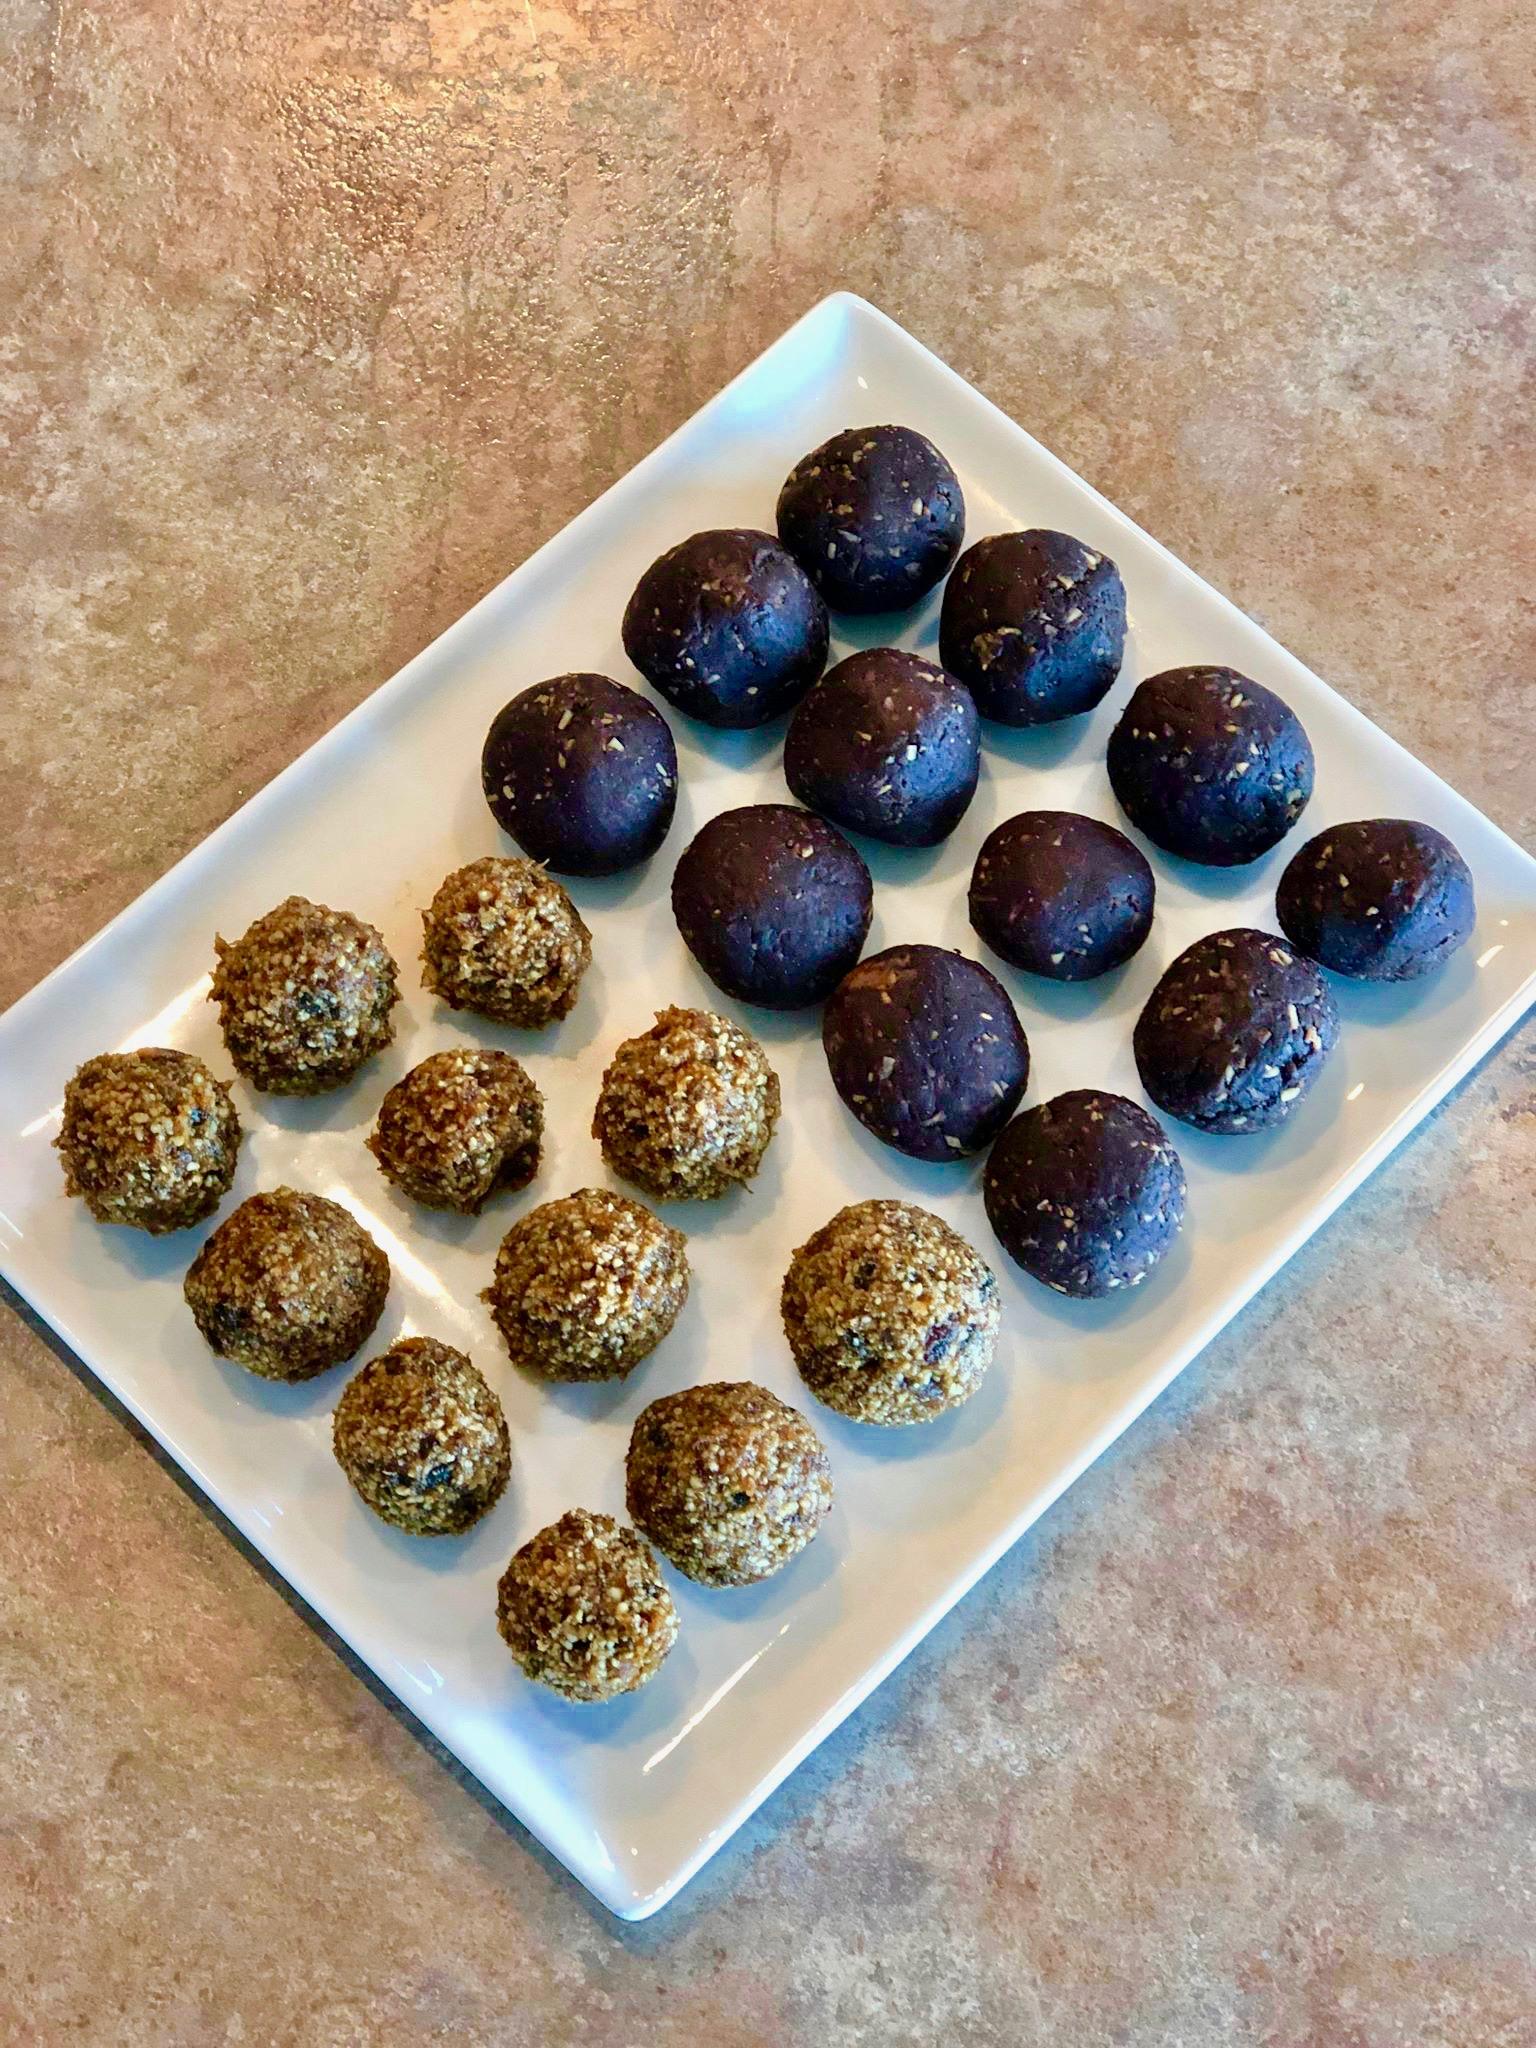 Janice Inspiring Change Sweet Treats